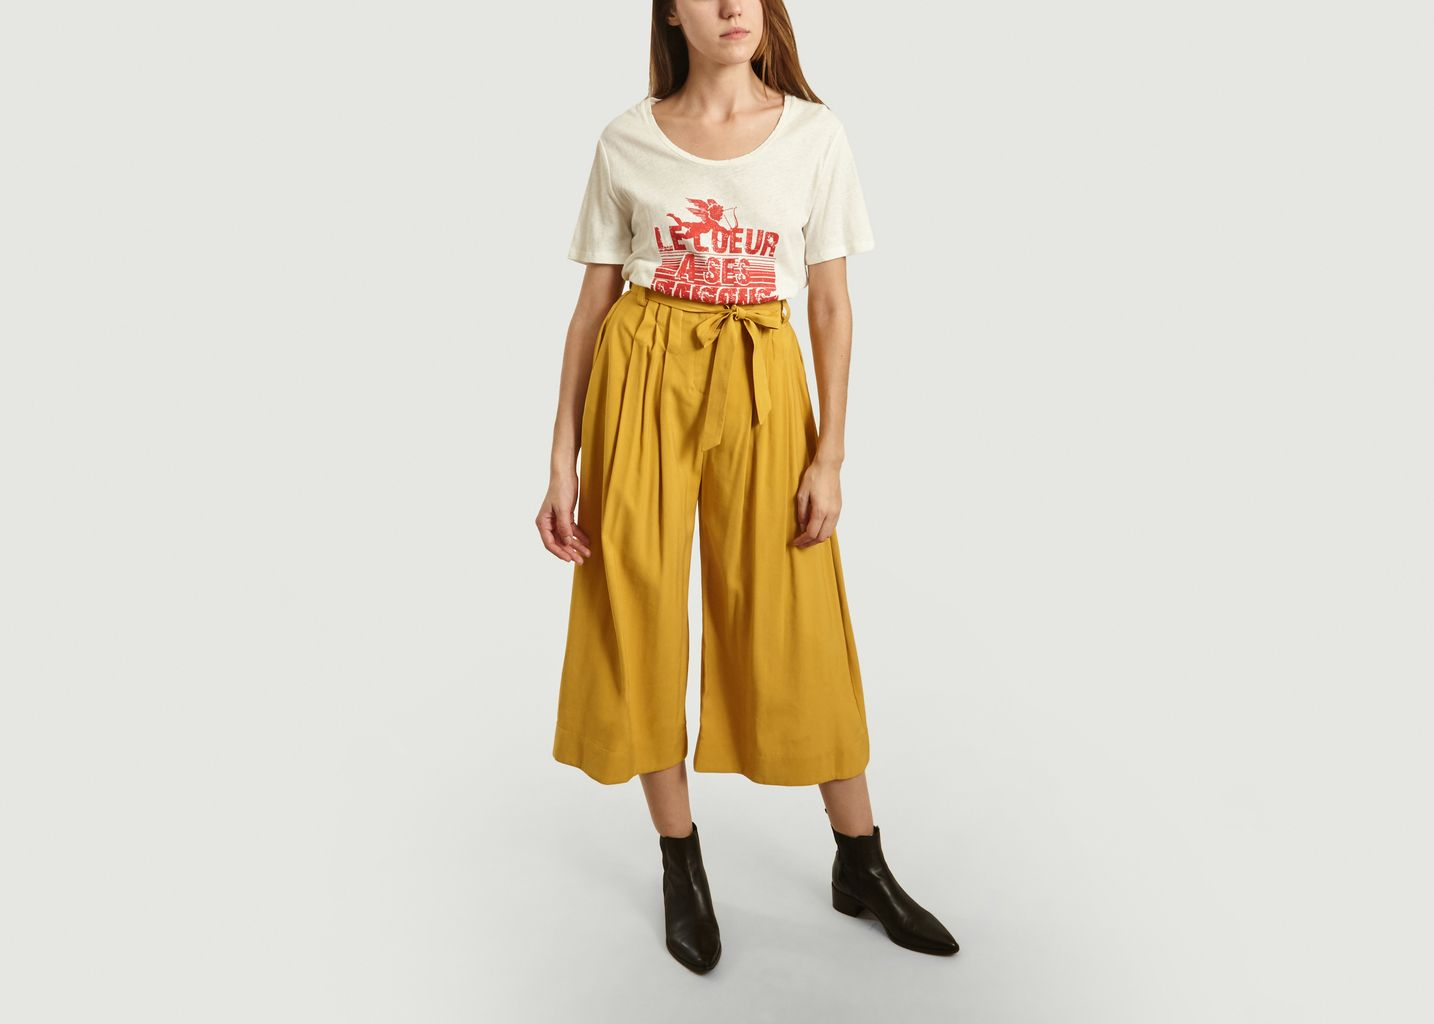 T-Shirt Imprimé Mickel - Suncoo